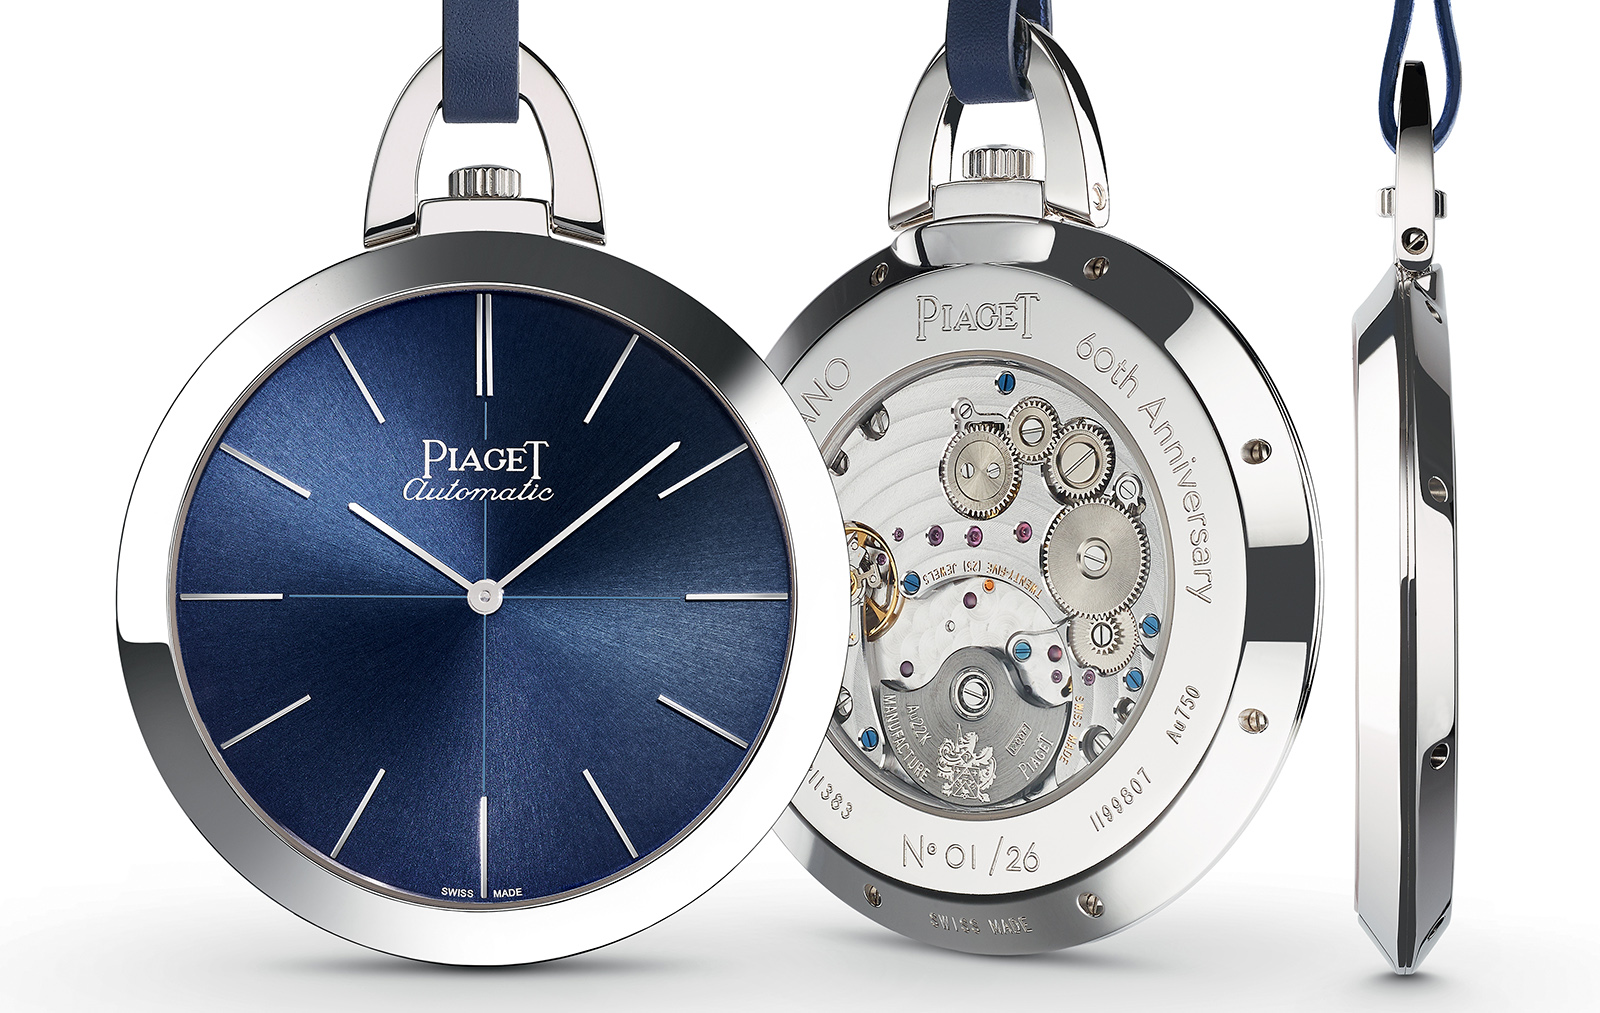 Piaget Altiplano 60th Anniversary Pocket Watch 1